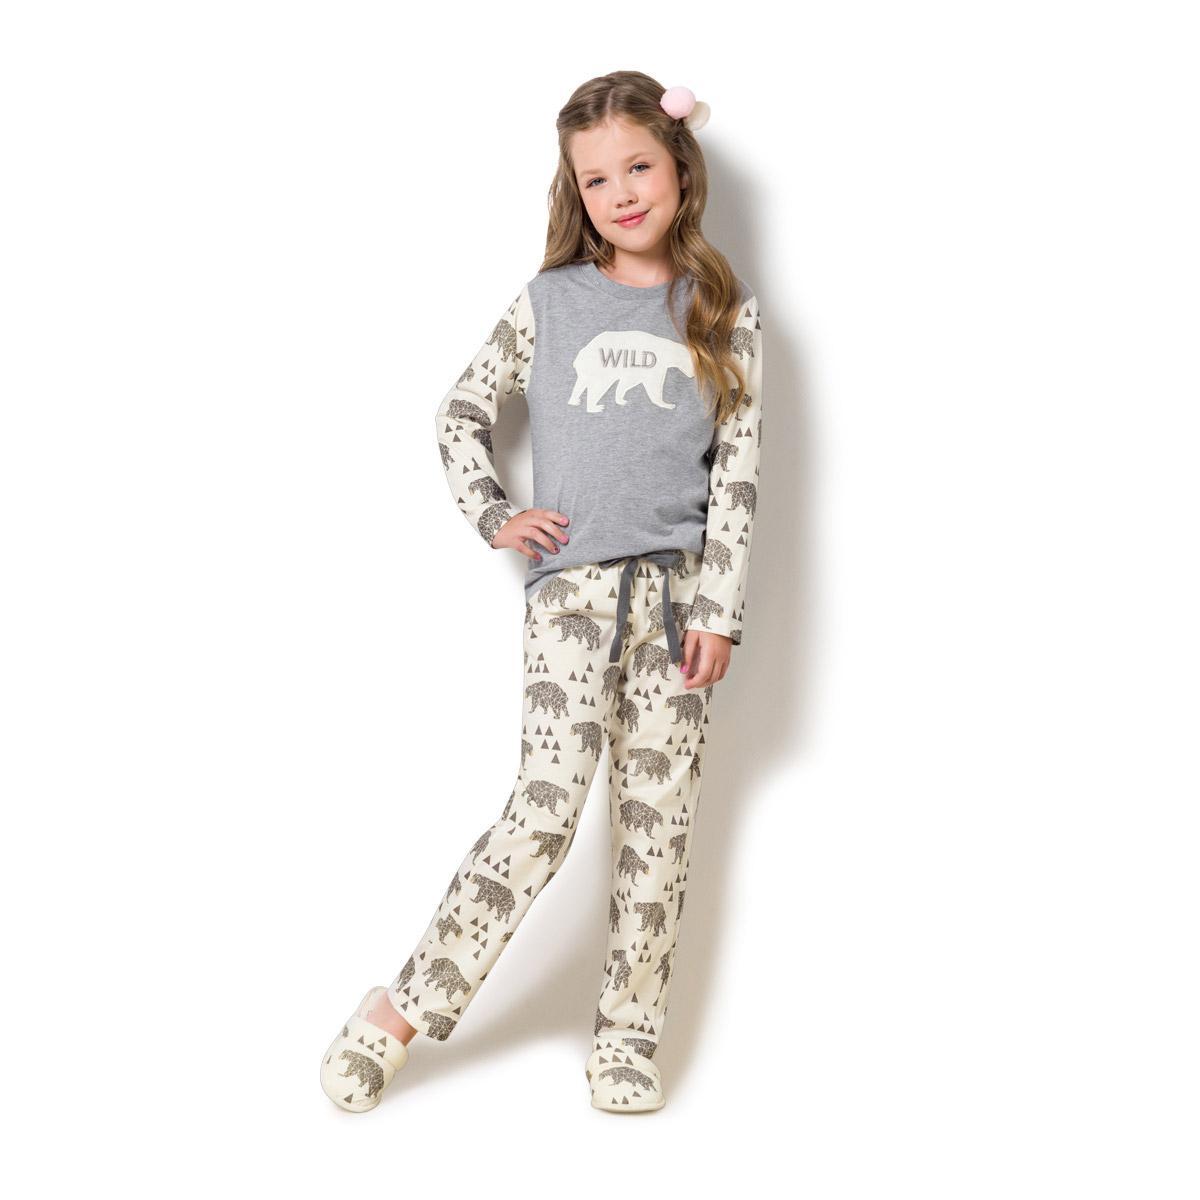 382d6bd563 Pijama manga longa infantil - louvre - Veggi - Pijama Infantil ...